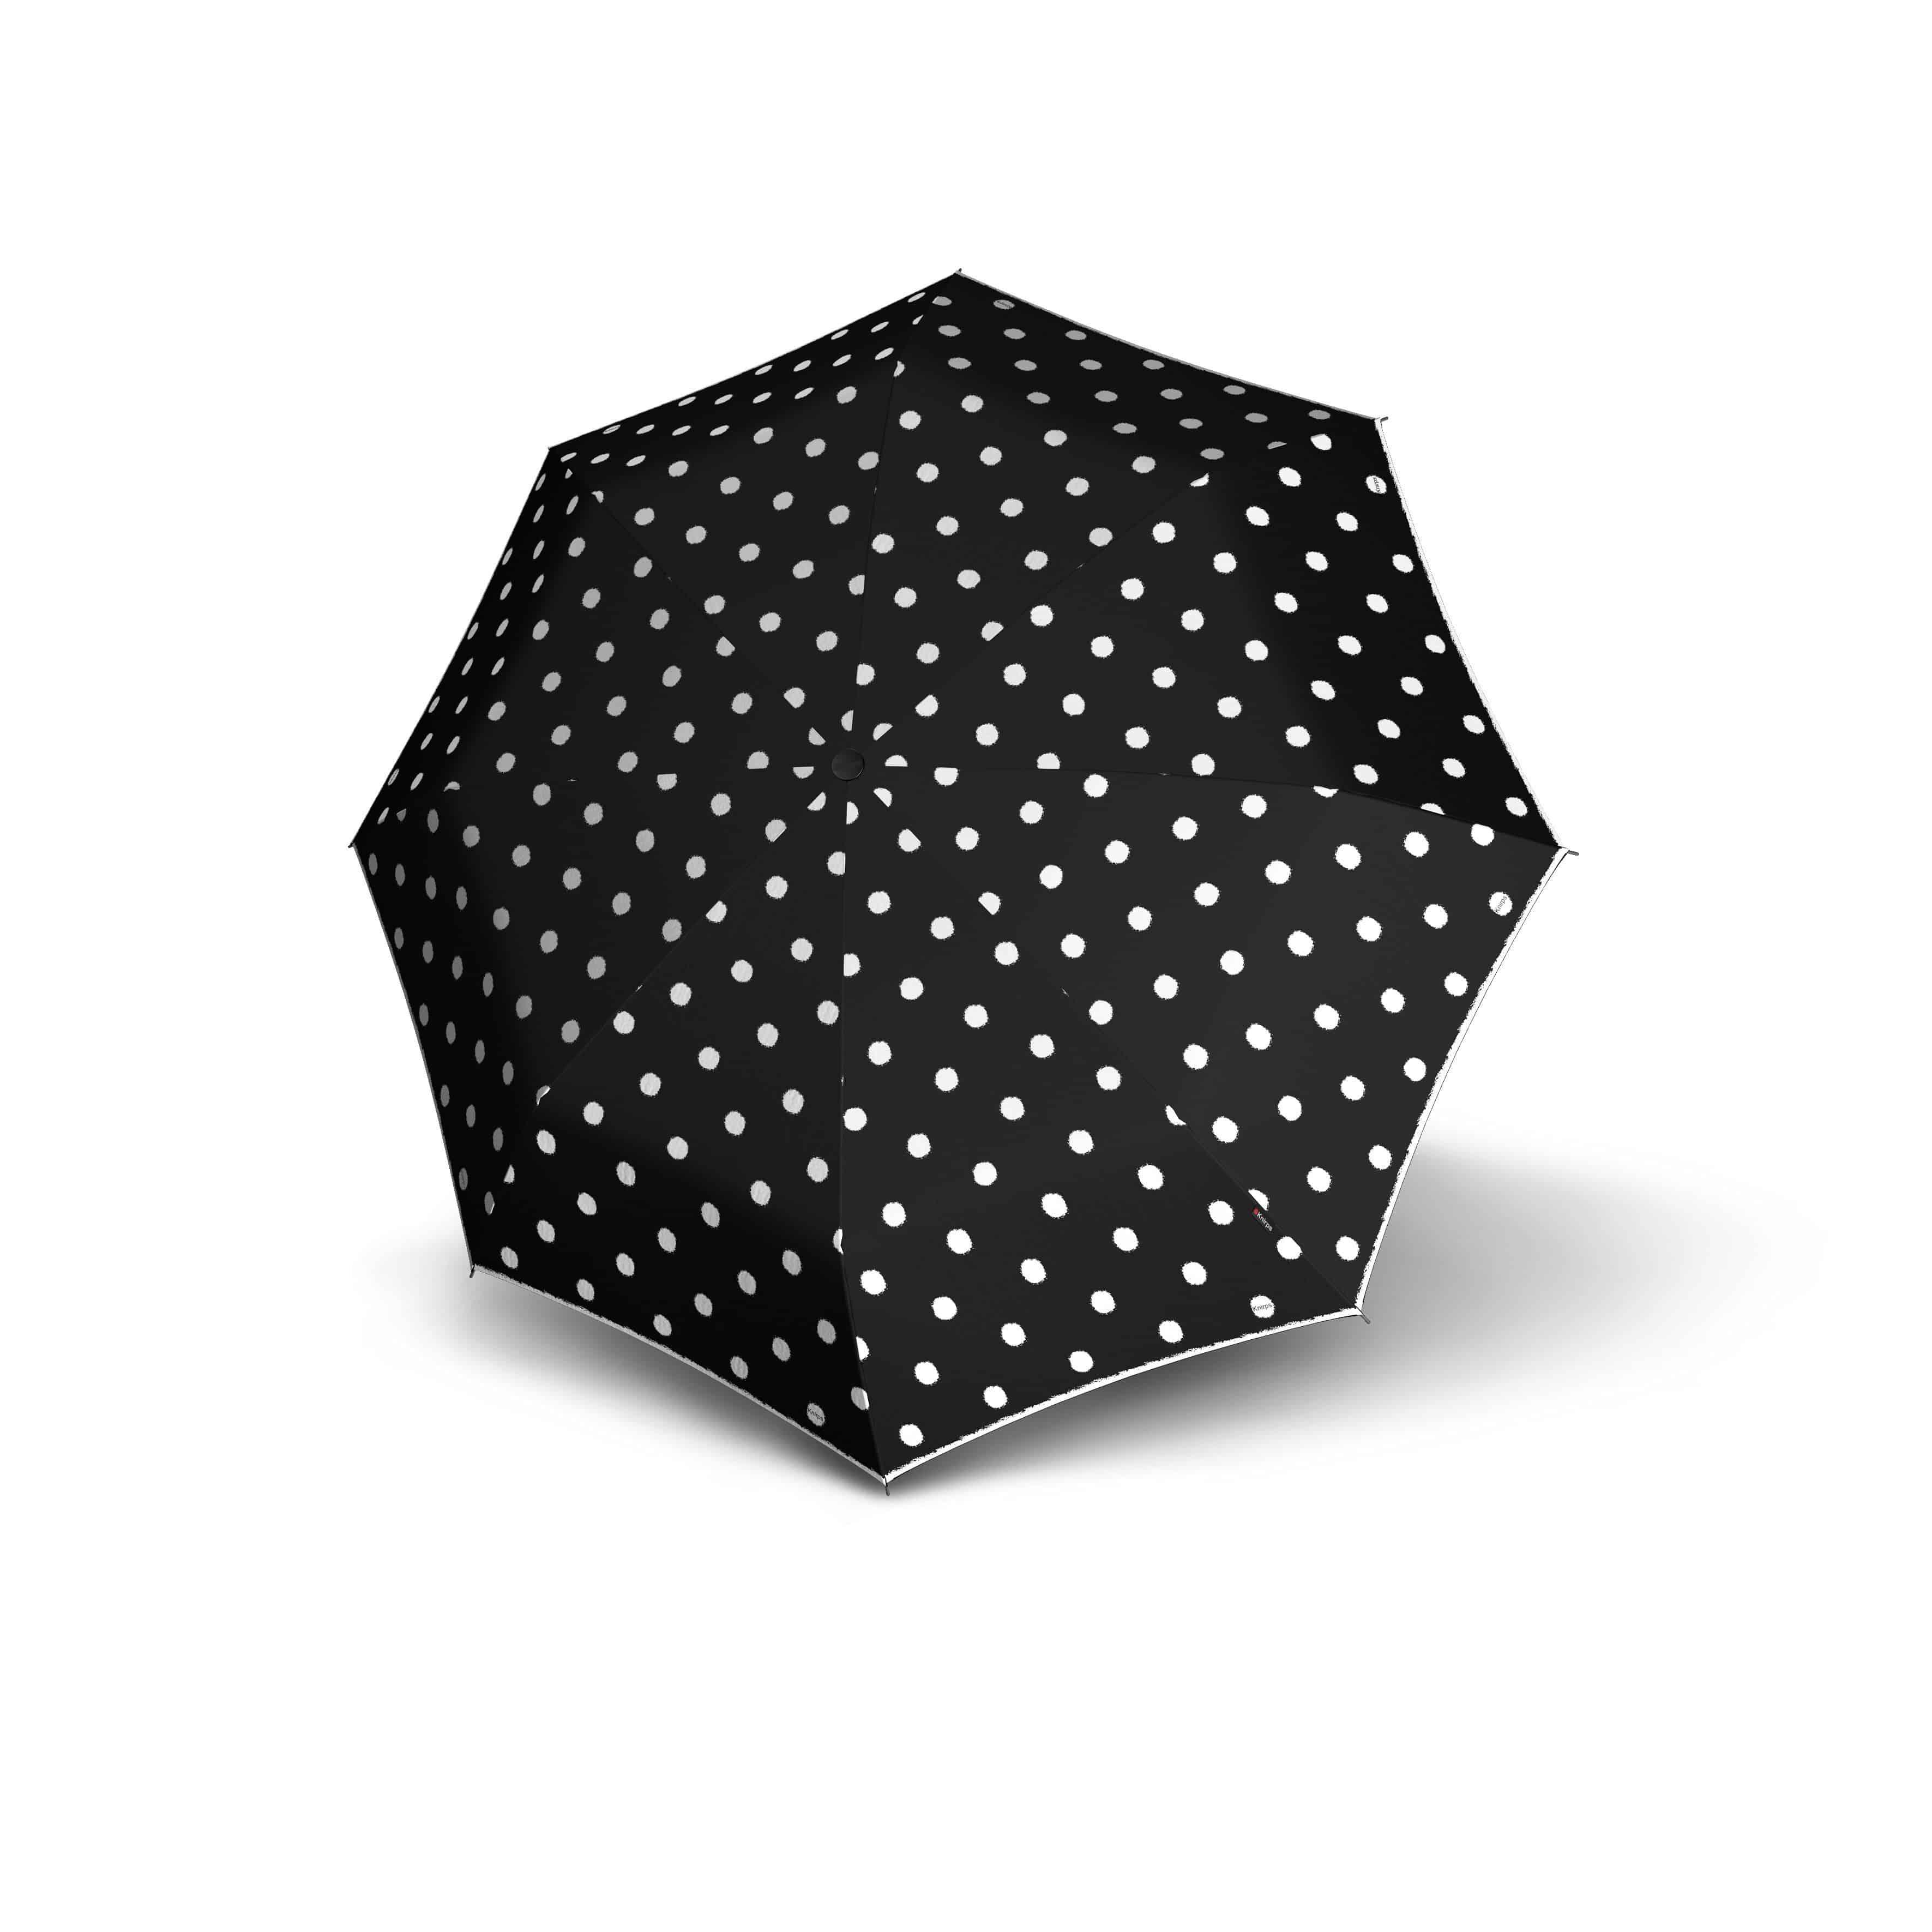 Knirps Umbrella T.703 stick automatic - foto 2